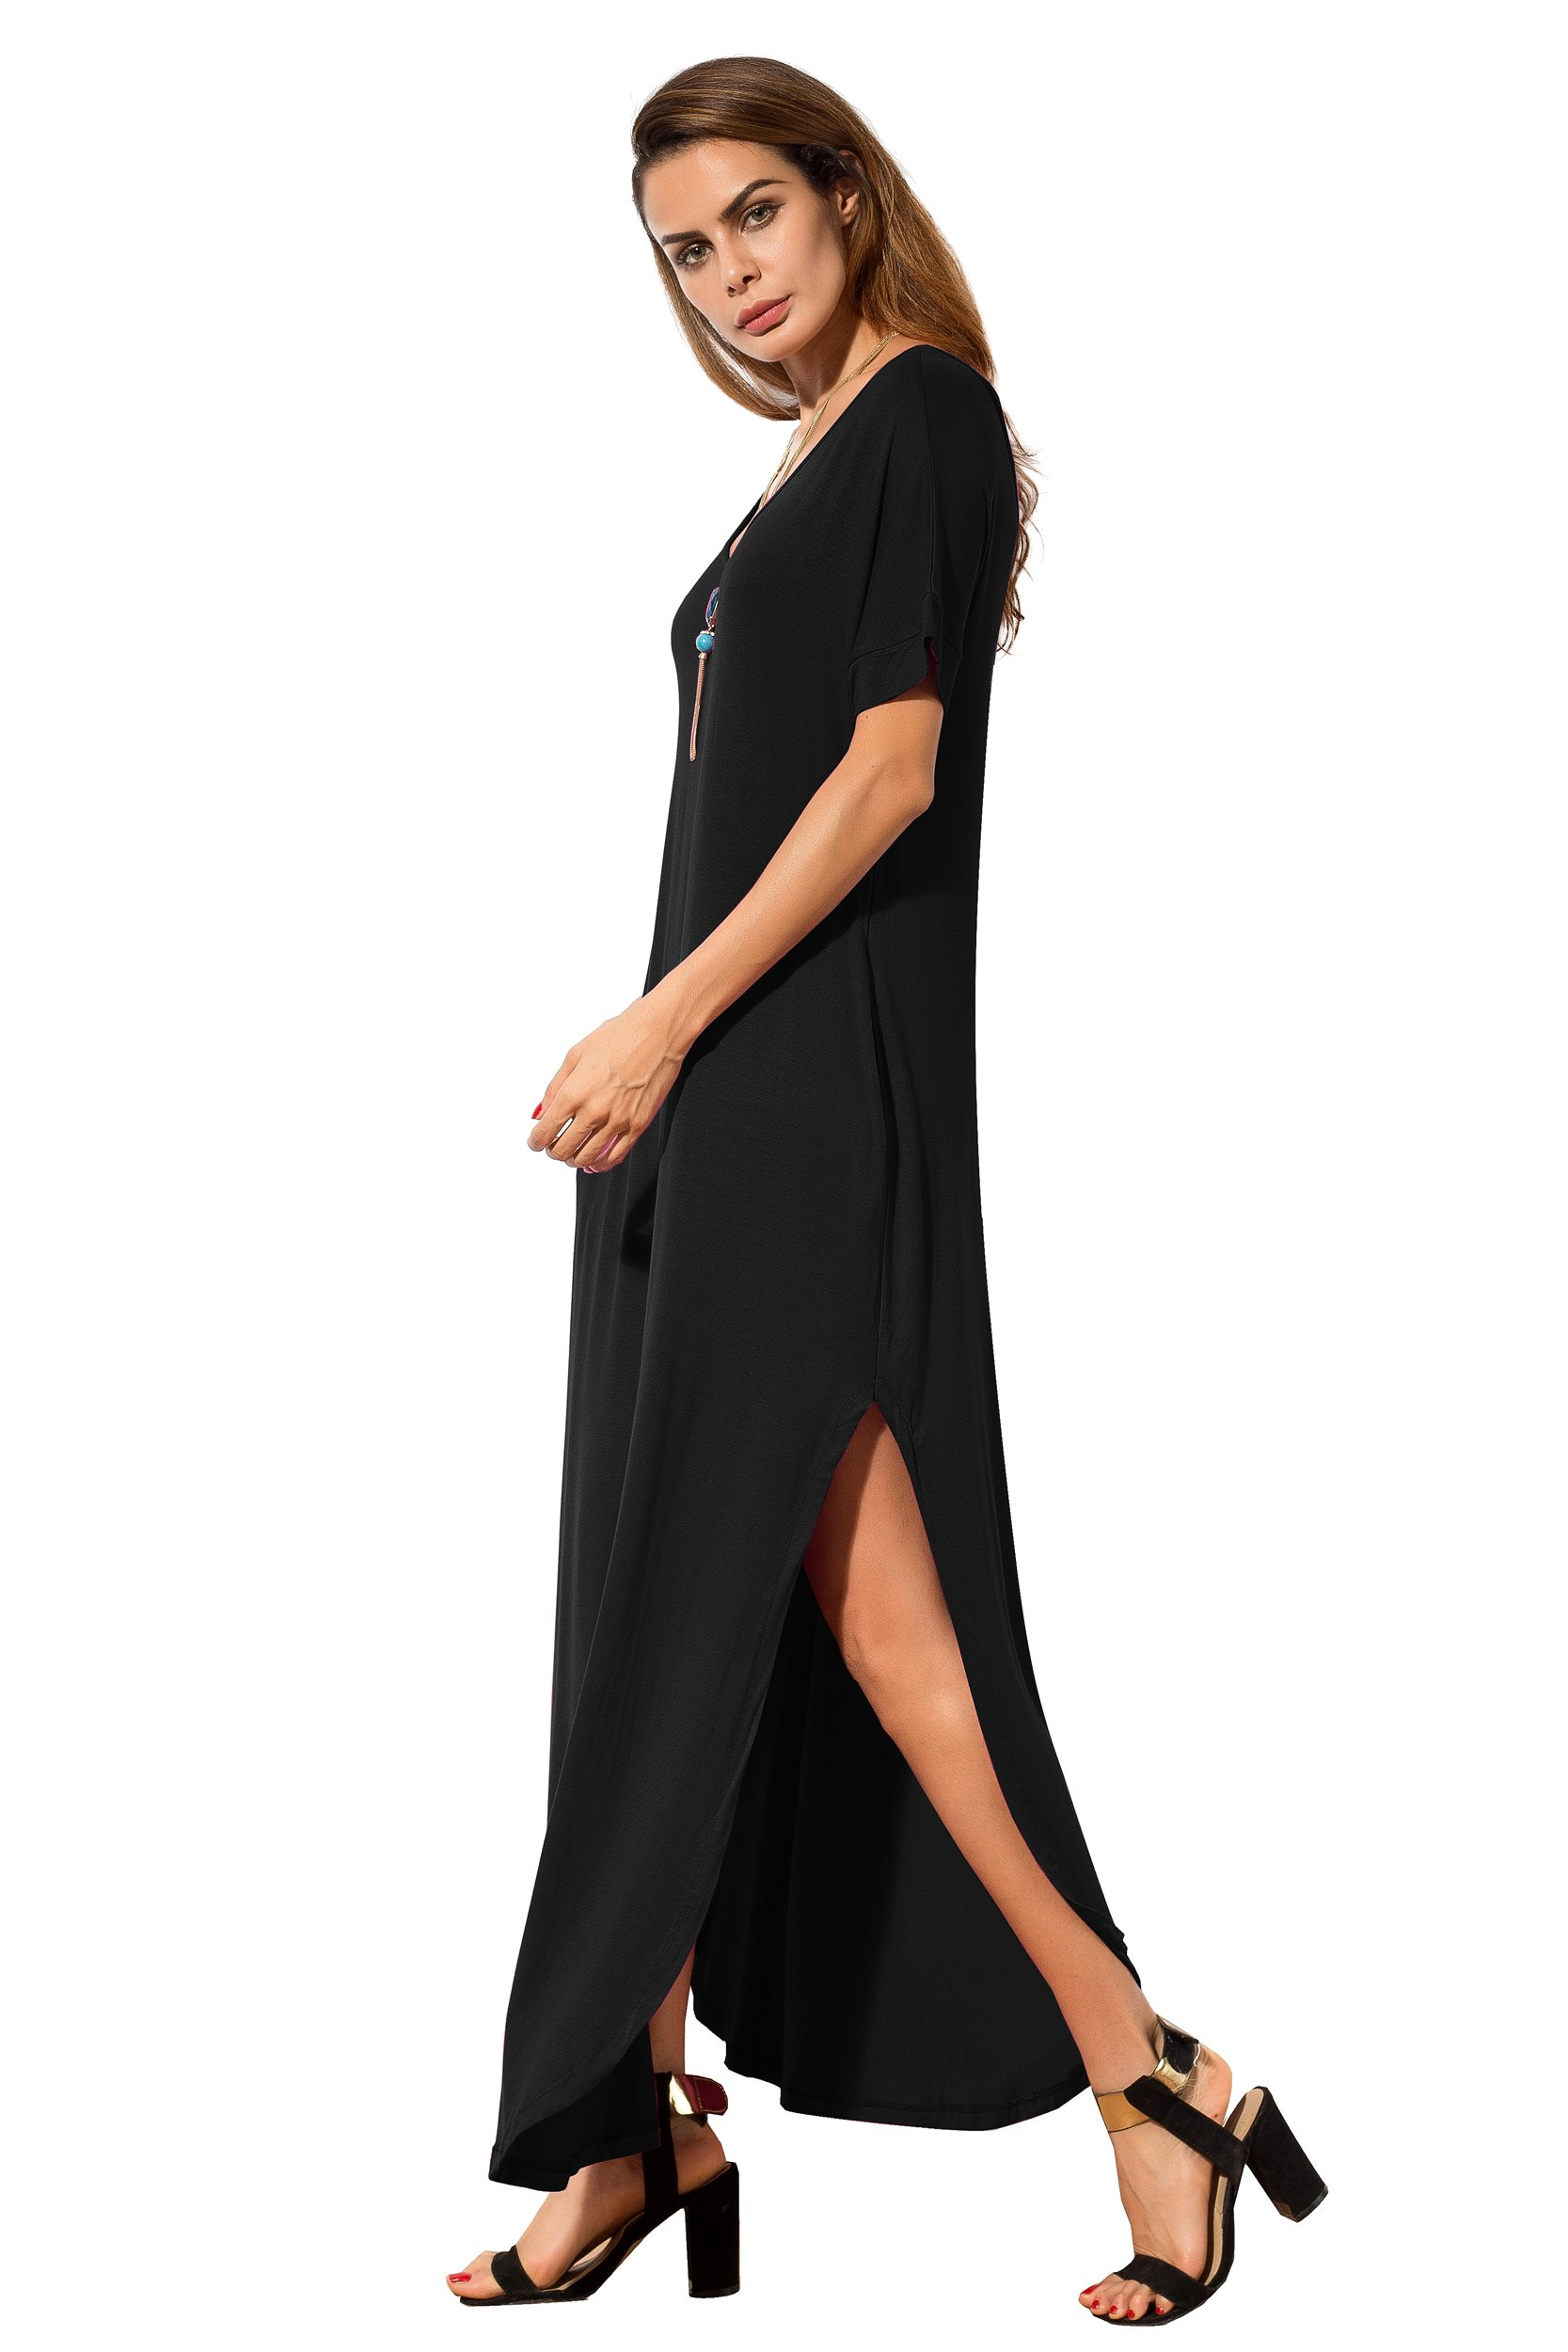 5bb1d260c535 ... Dresses/GRECERELLE Women's Casual Loose Pocket Long Dress Short Sleeve  Split Maxi Dresses. Sale!